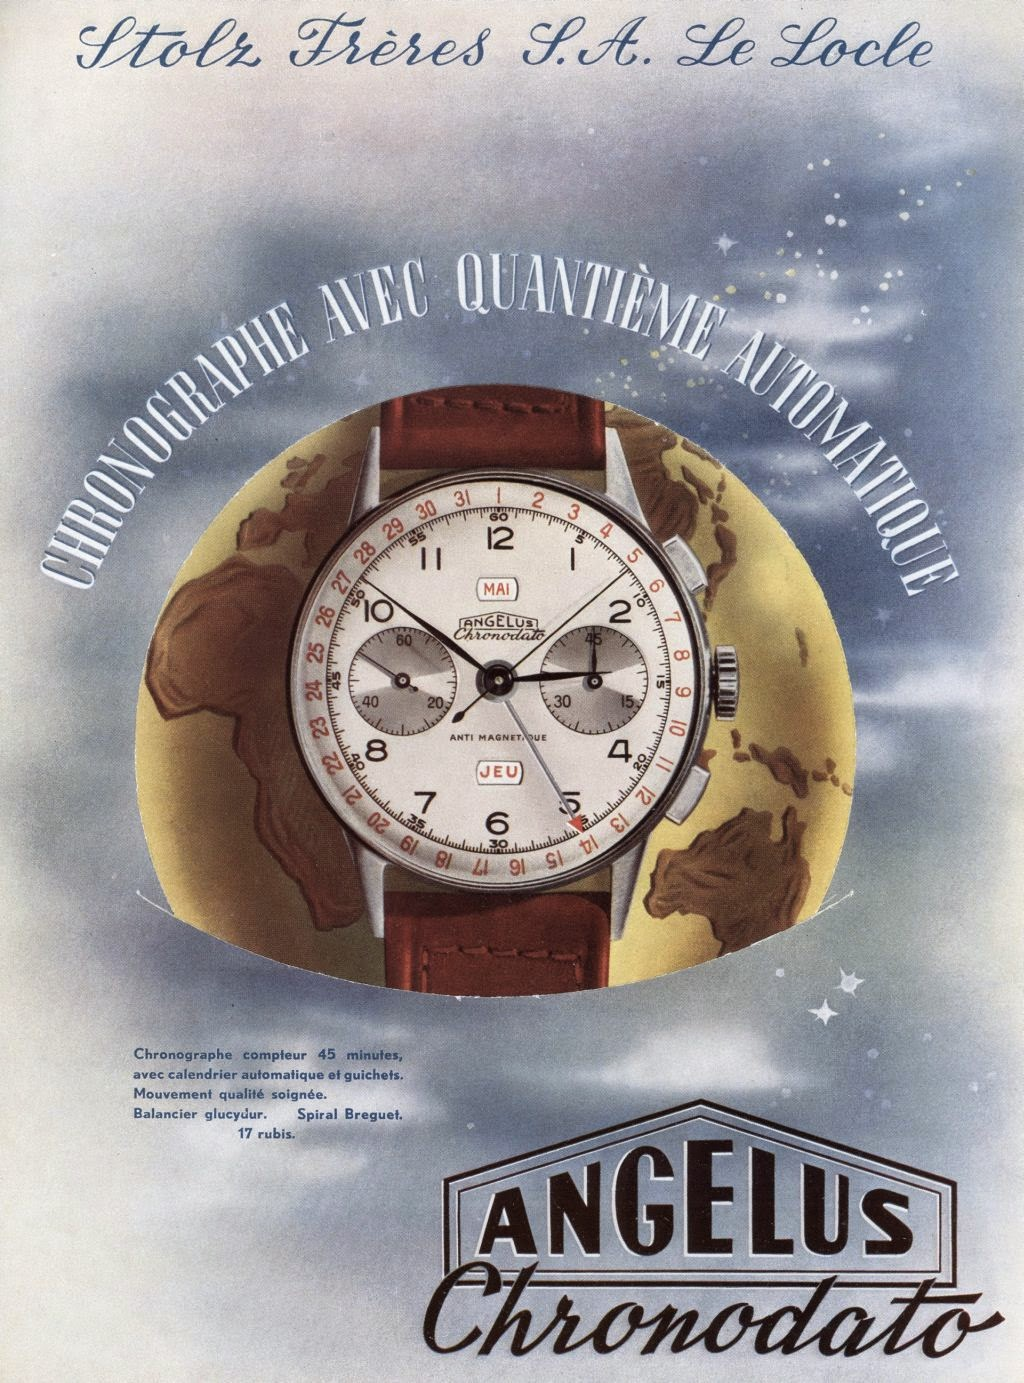 Advertising Angelus Chronodato